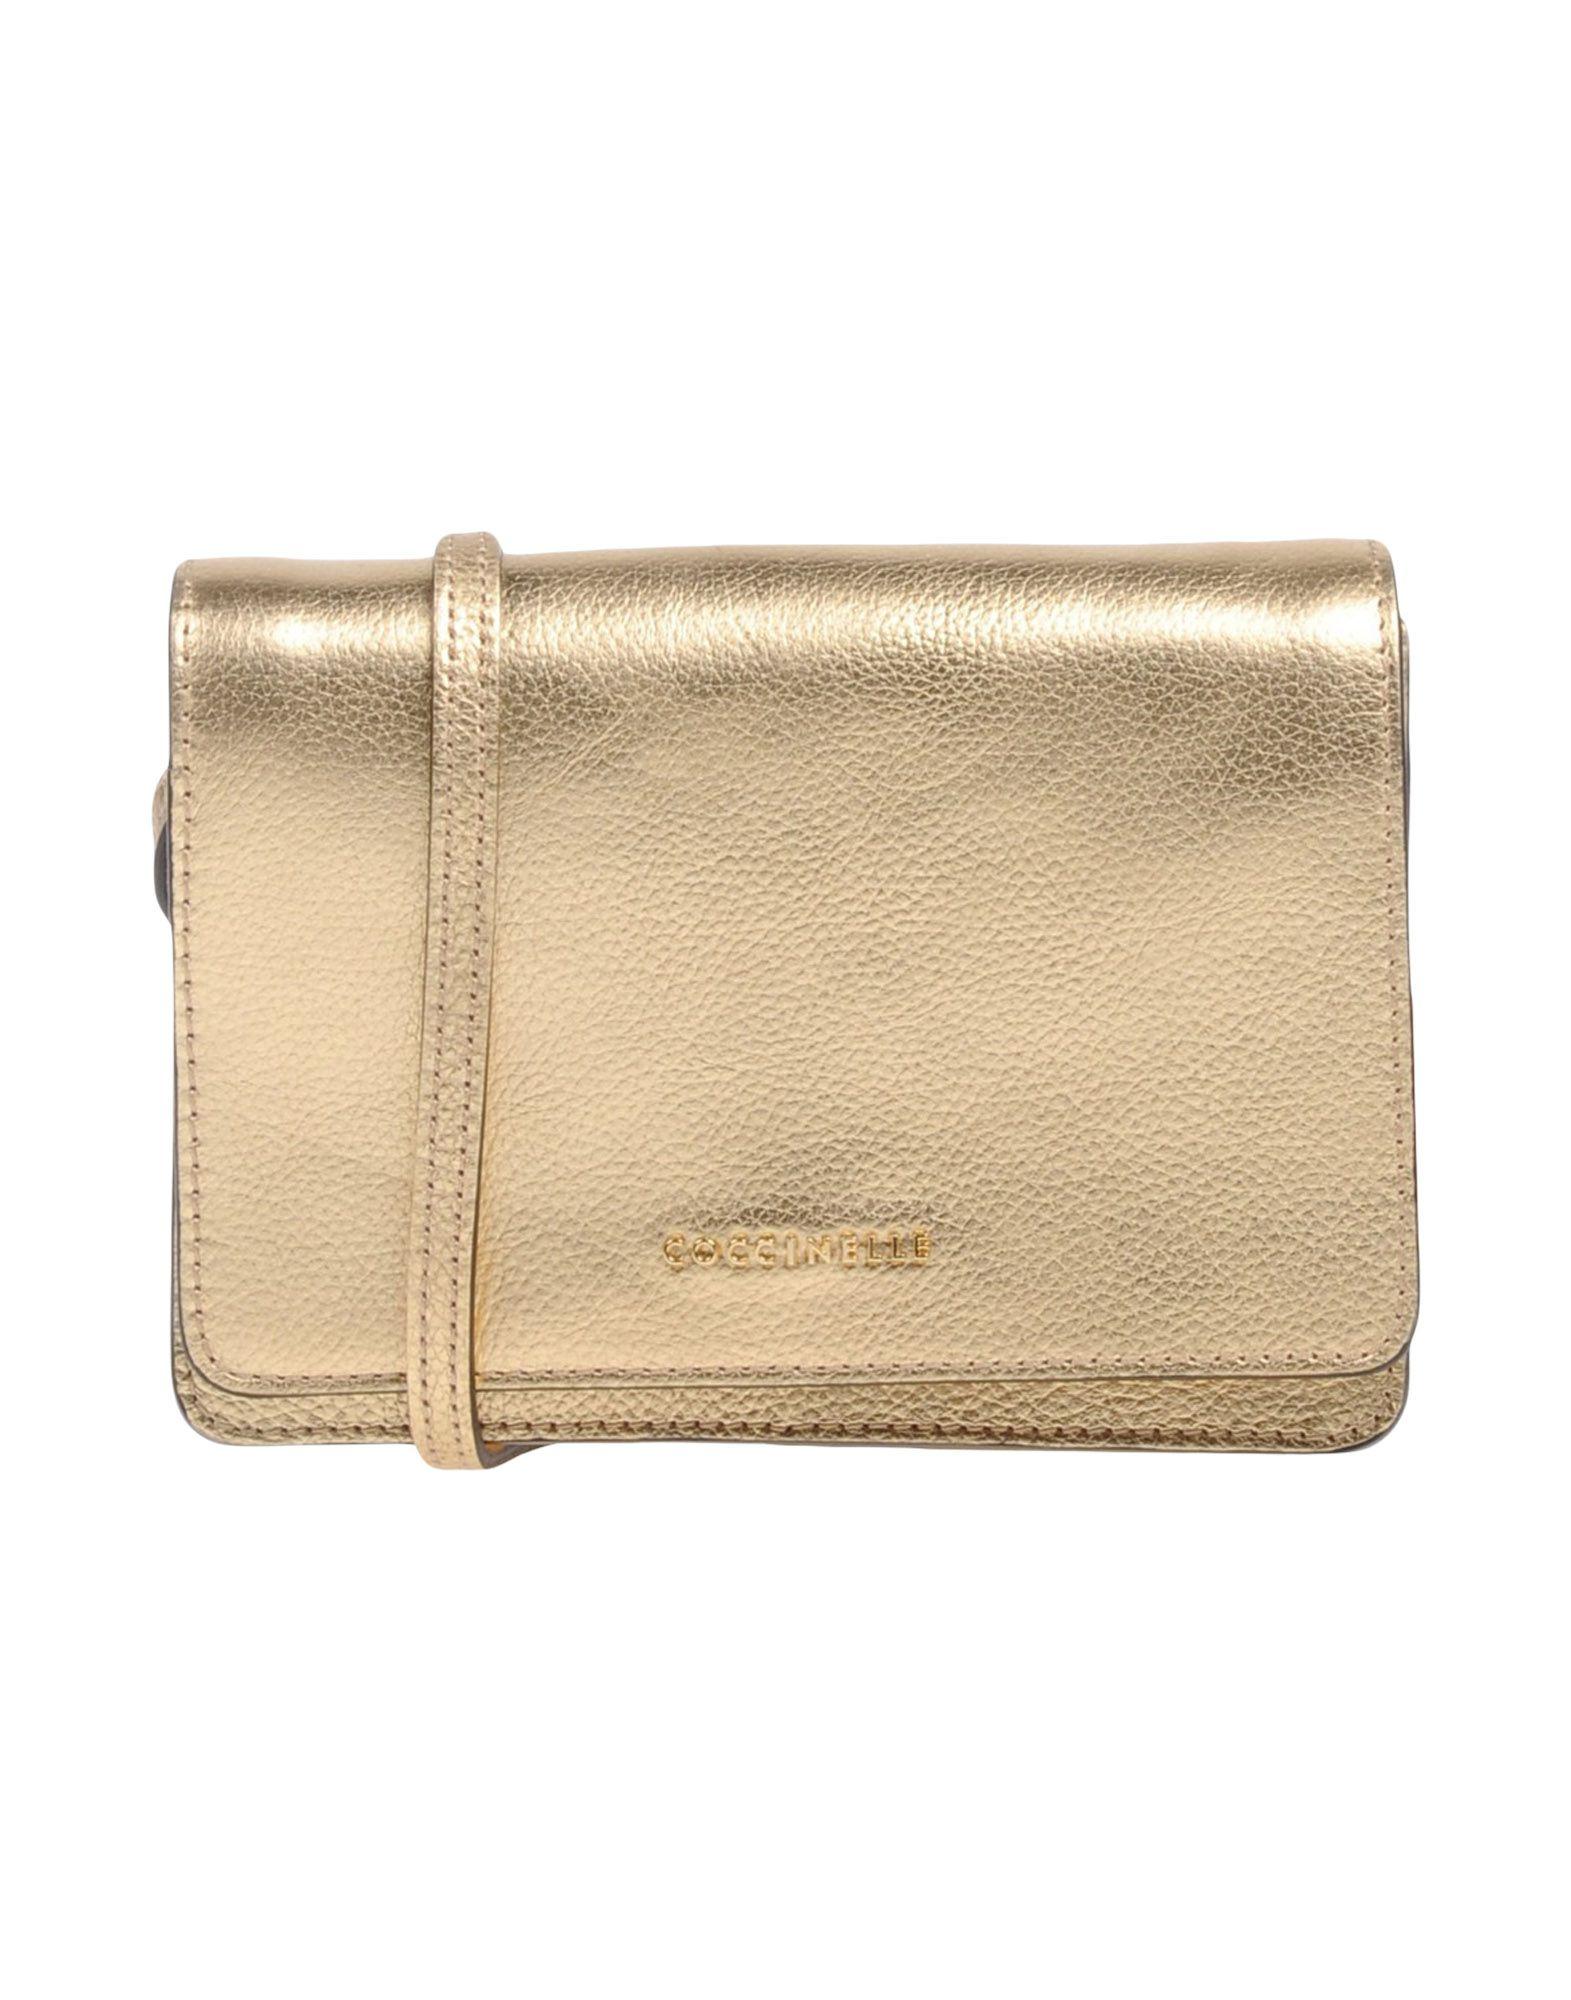 COCCINELLE Сумка через плечо сумка coccinelle c1 ye0 18 01 01 001